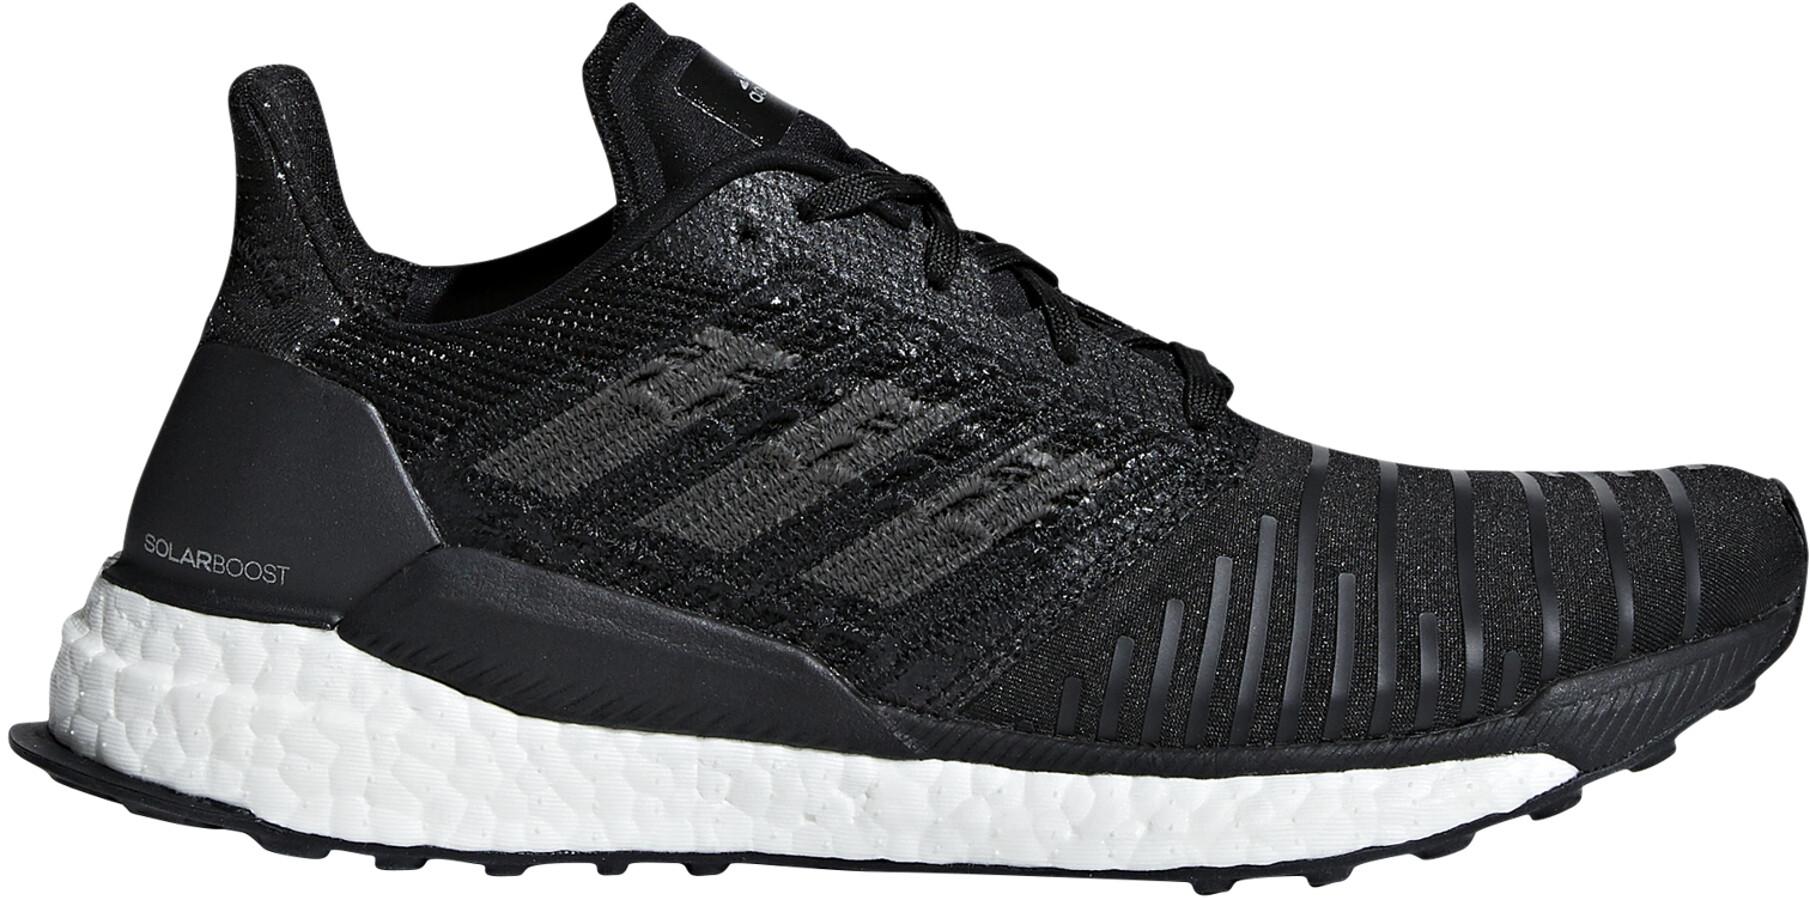 reputable site e0741 71b68 ... purchase adidas solar boost chaussures running femme noir 3cb72 e8c9c